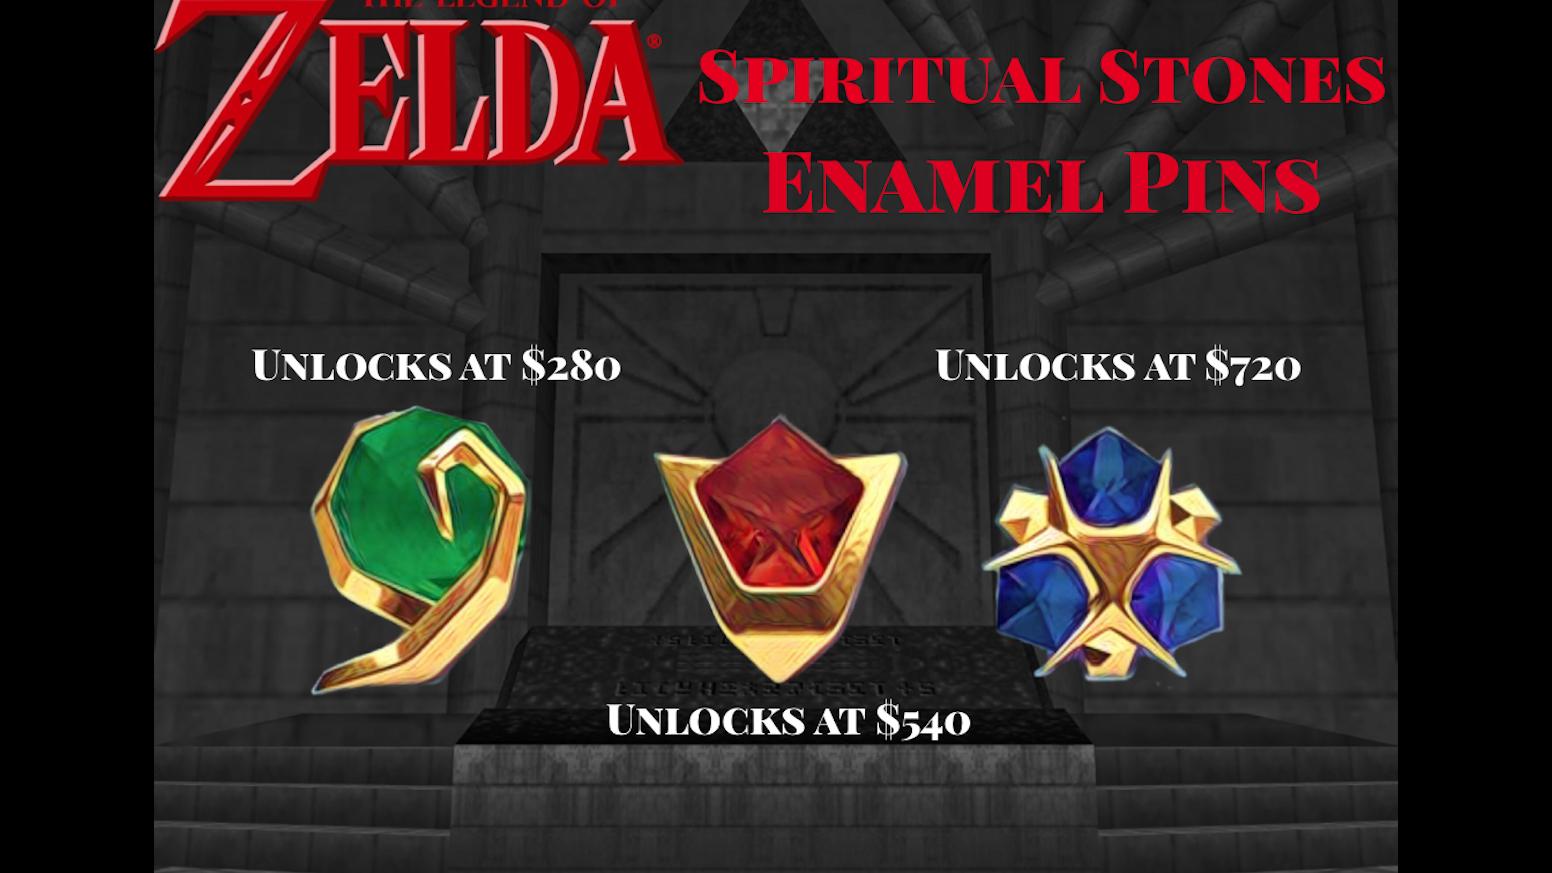 Zelda Spiritual Stones Enamel Pins by Dan the Biology Man